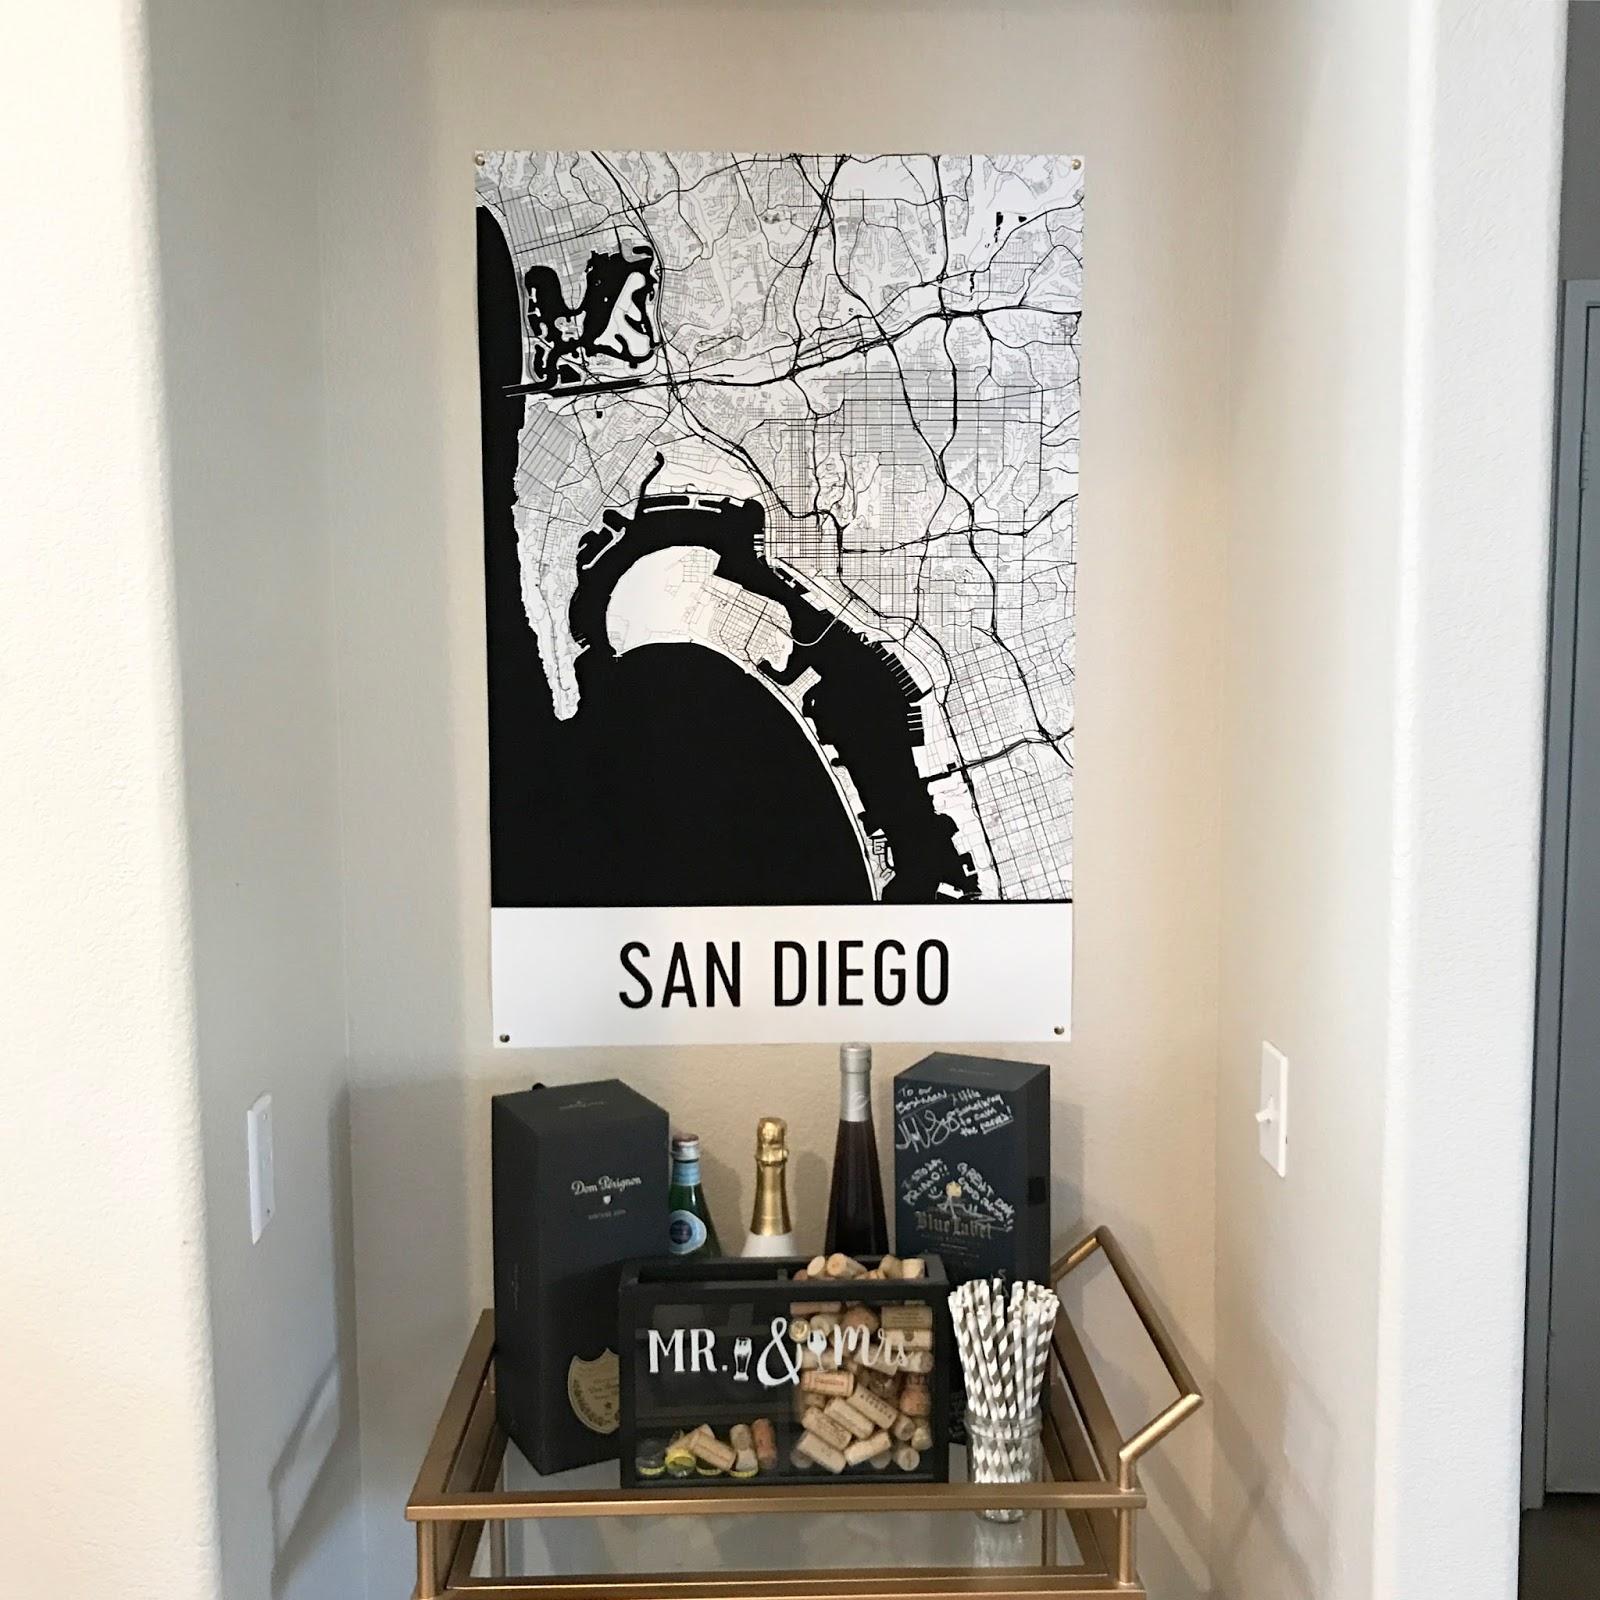 San Diego Poster, San Diego art, San Diego map art